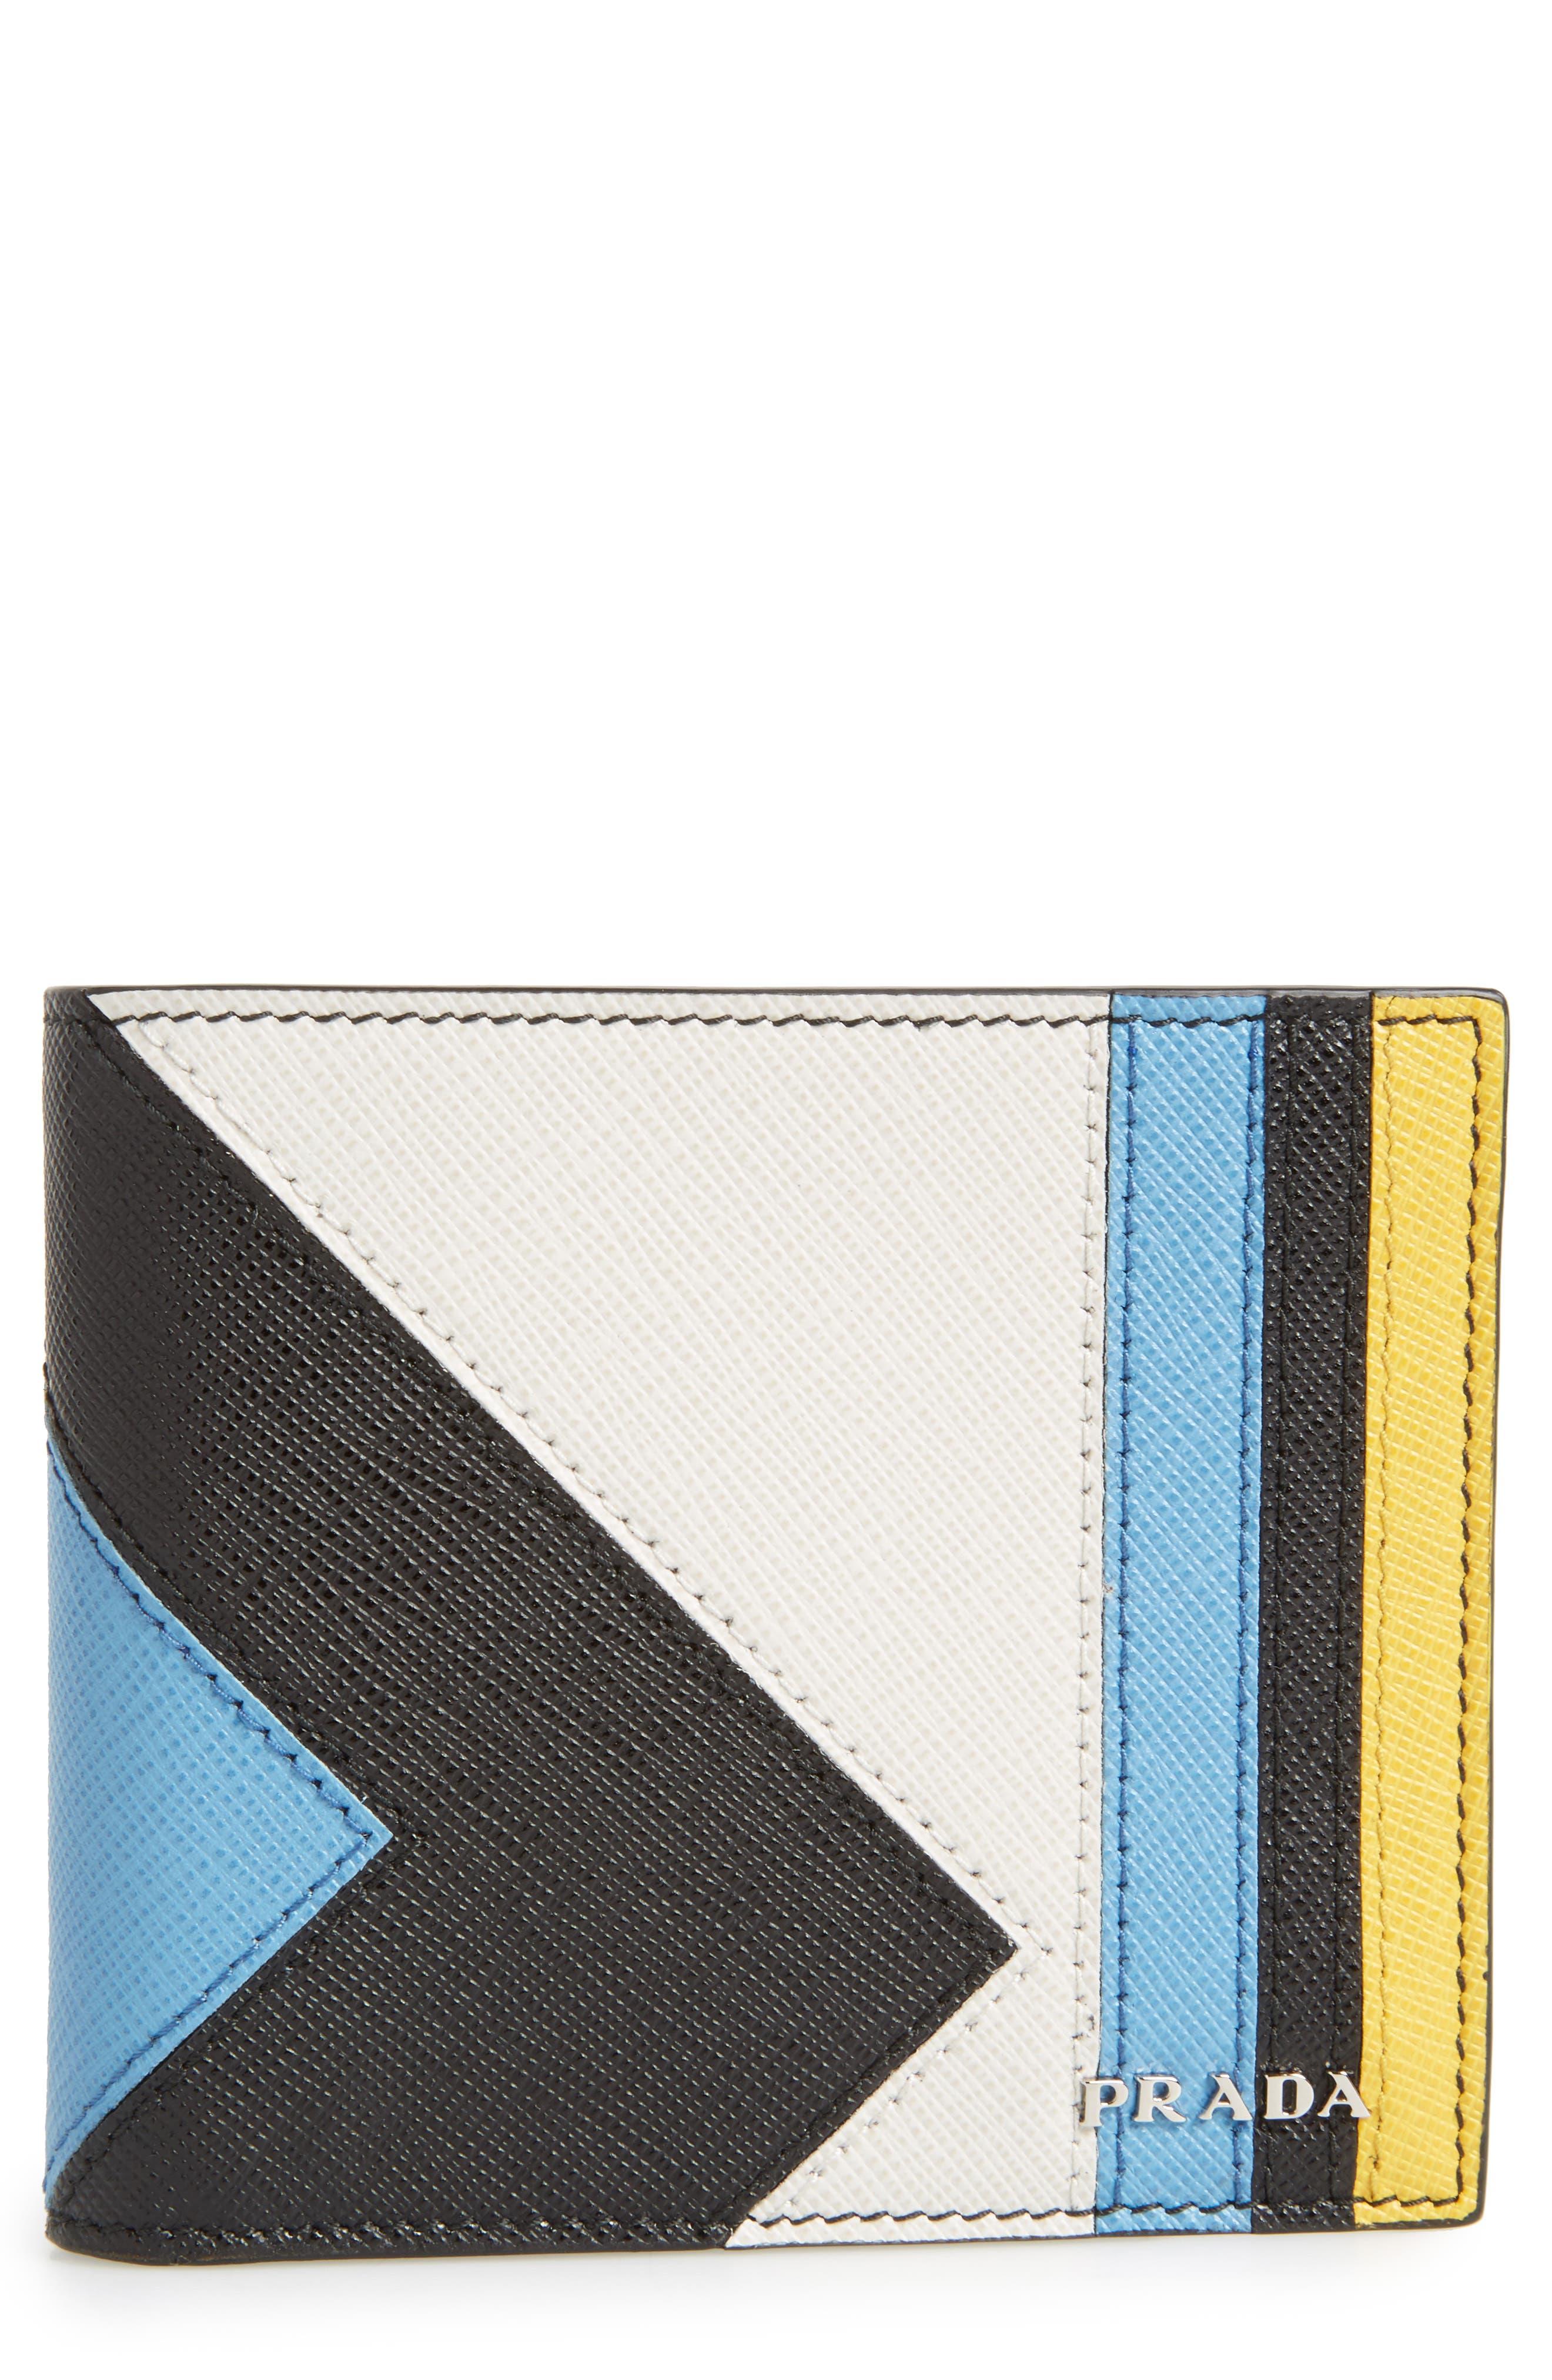 Main Image - Prada Arrow Calfskin Leather Wallet